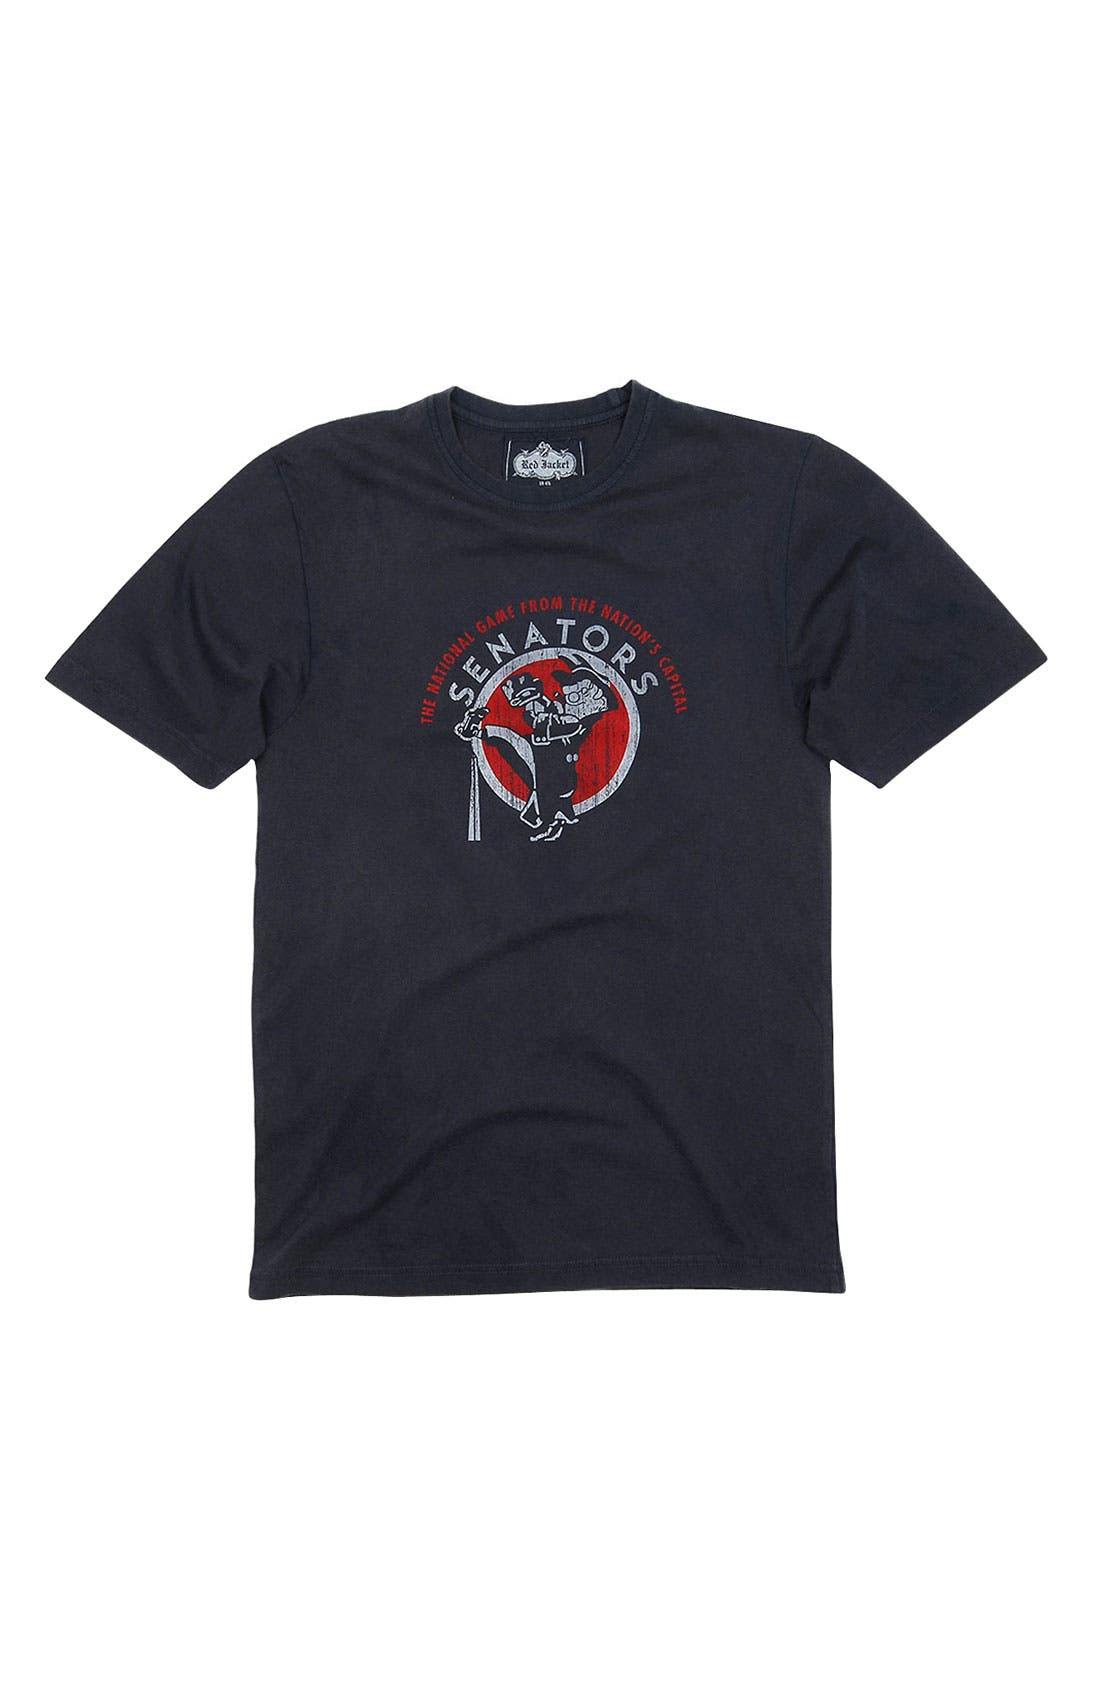 Alternate Image 1 Selected - Red Jacket 'Washington Senators' Trim Fit T-Shirt (Men)